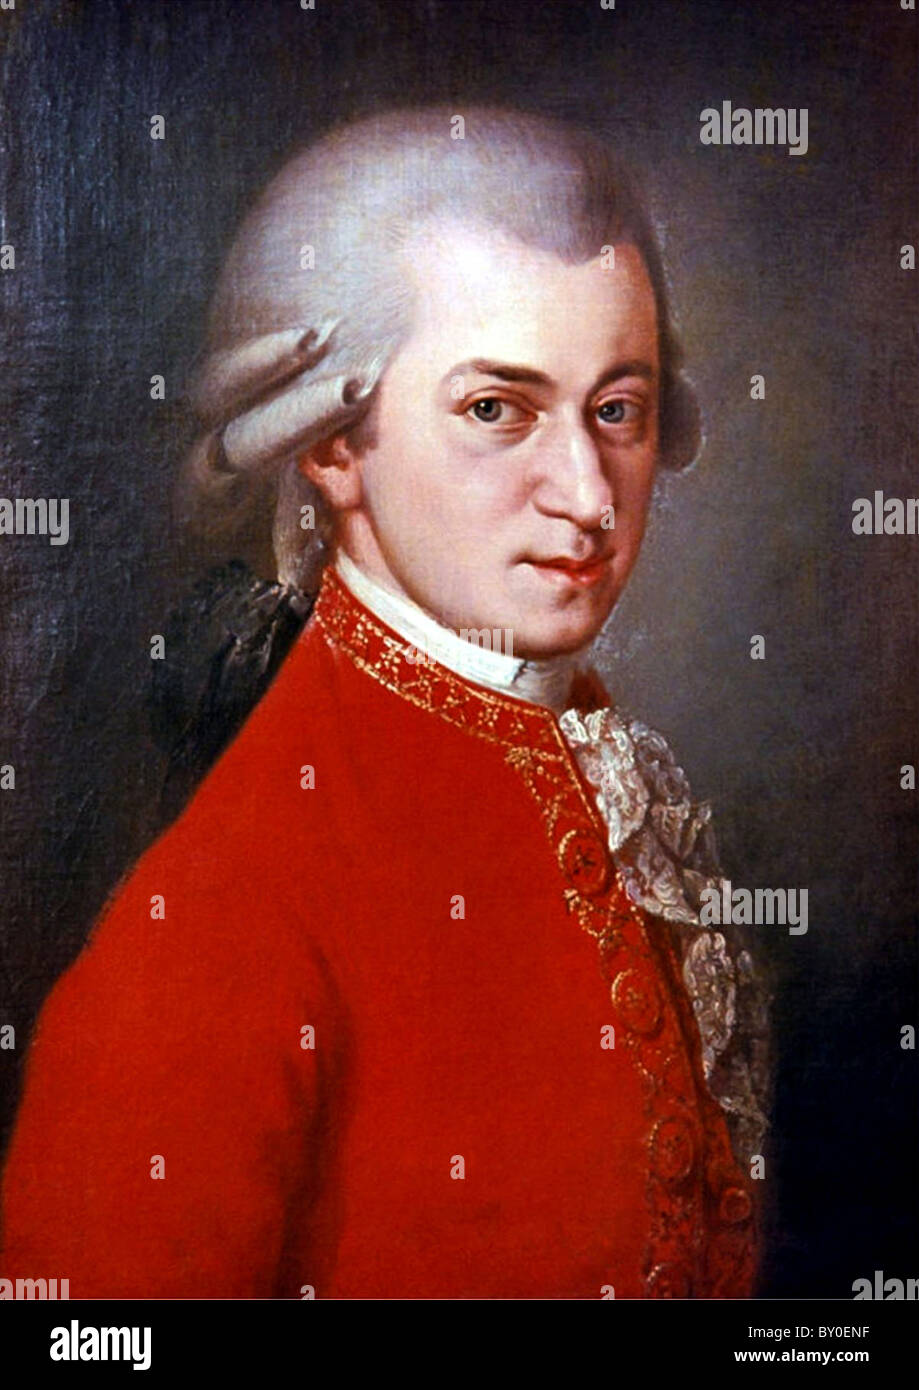 Mozart, compositeur Wolfgang Amadeus Mozart Photo Stock